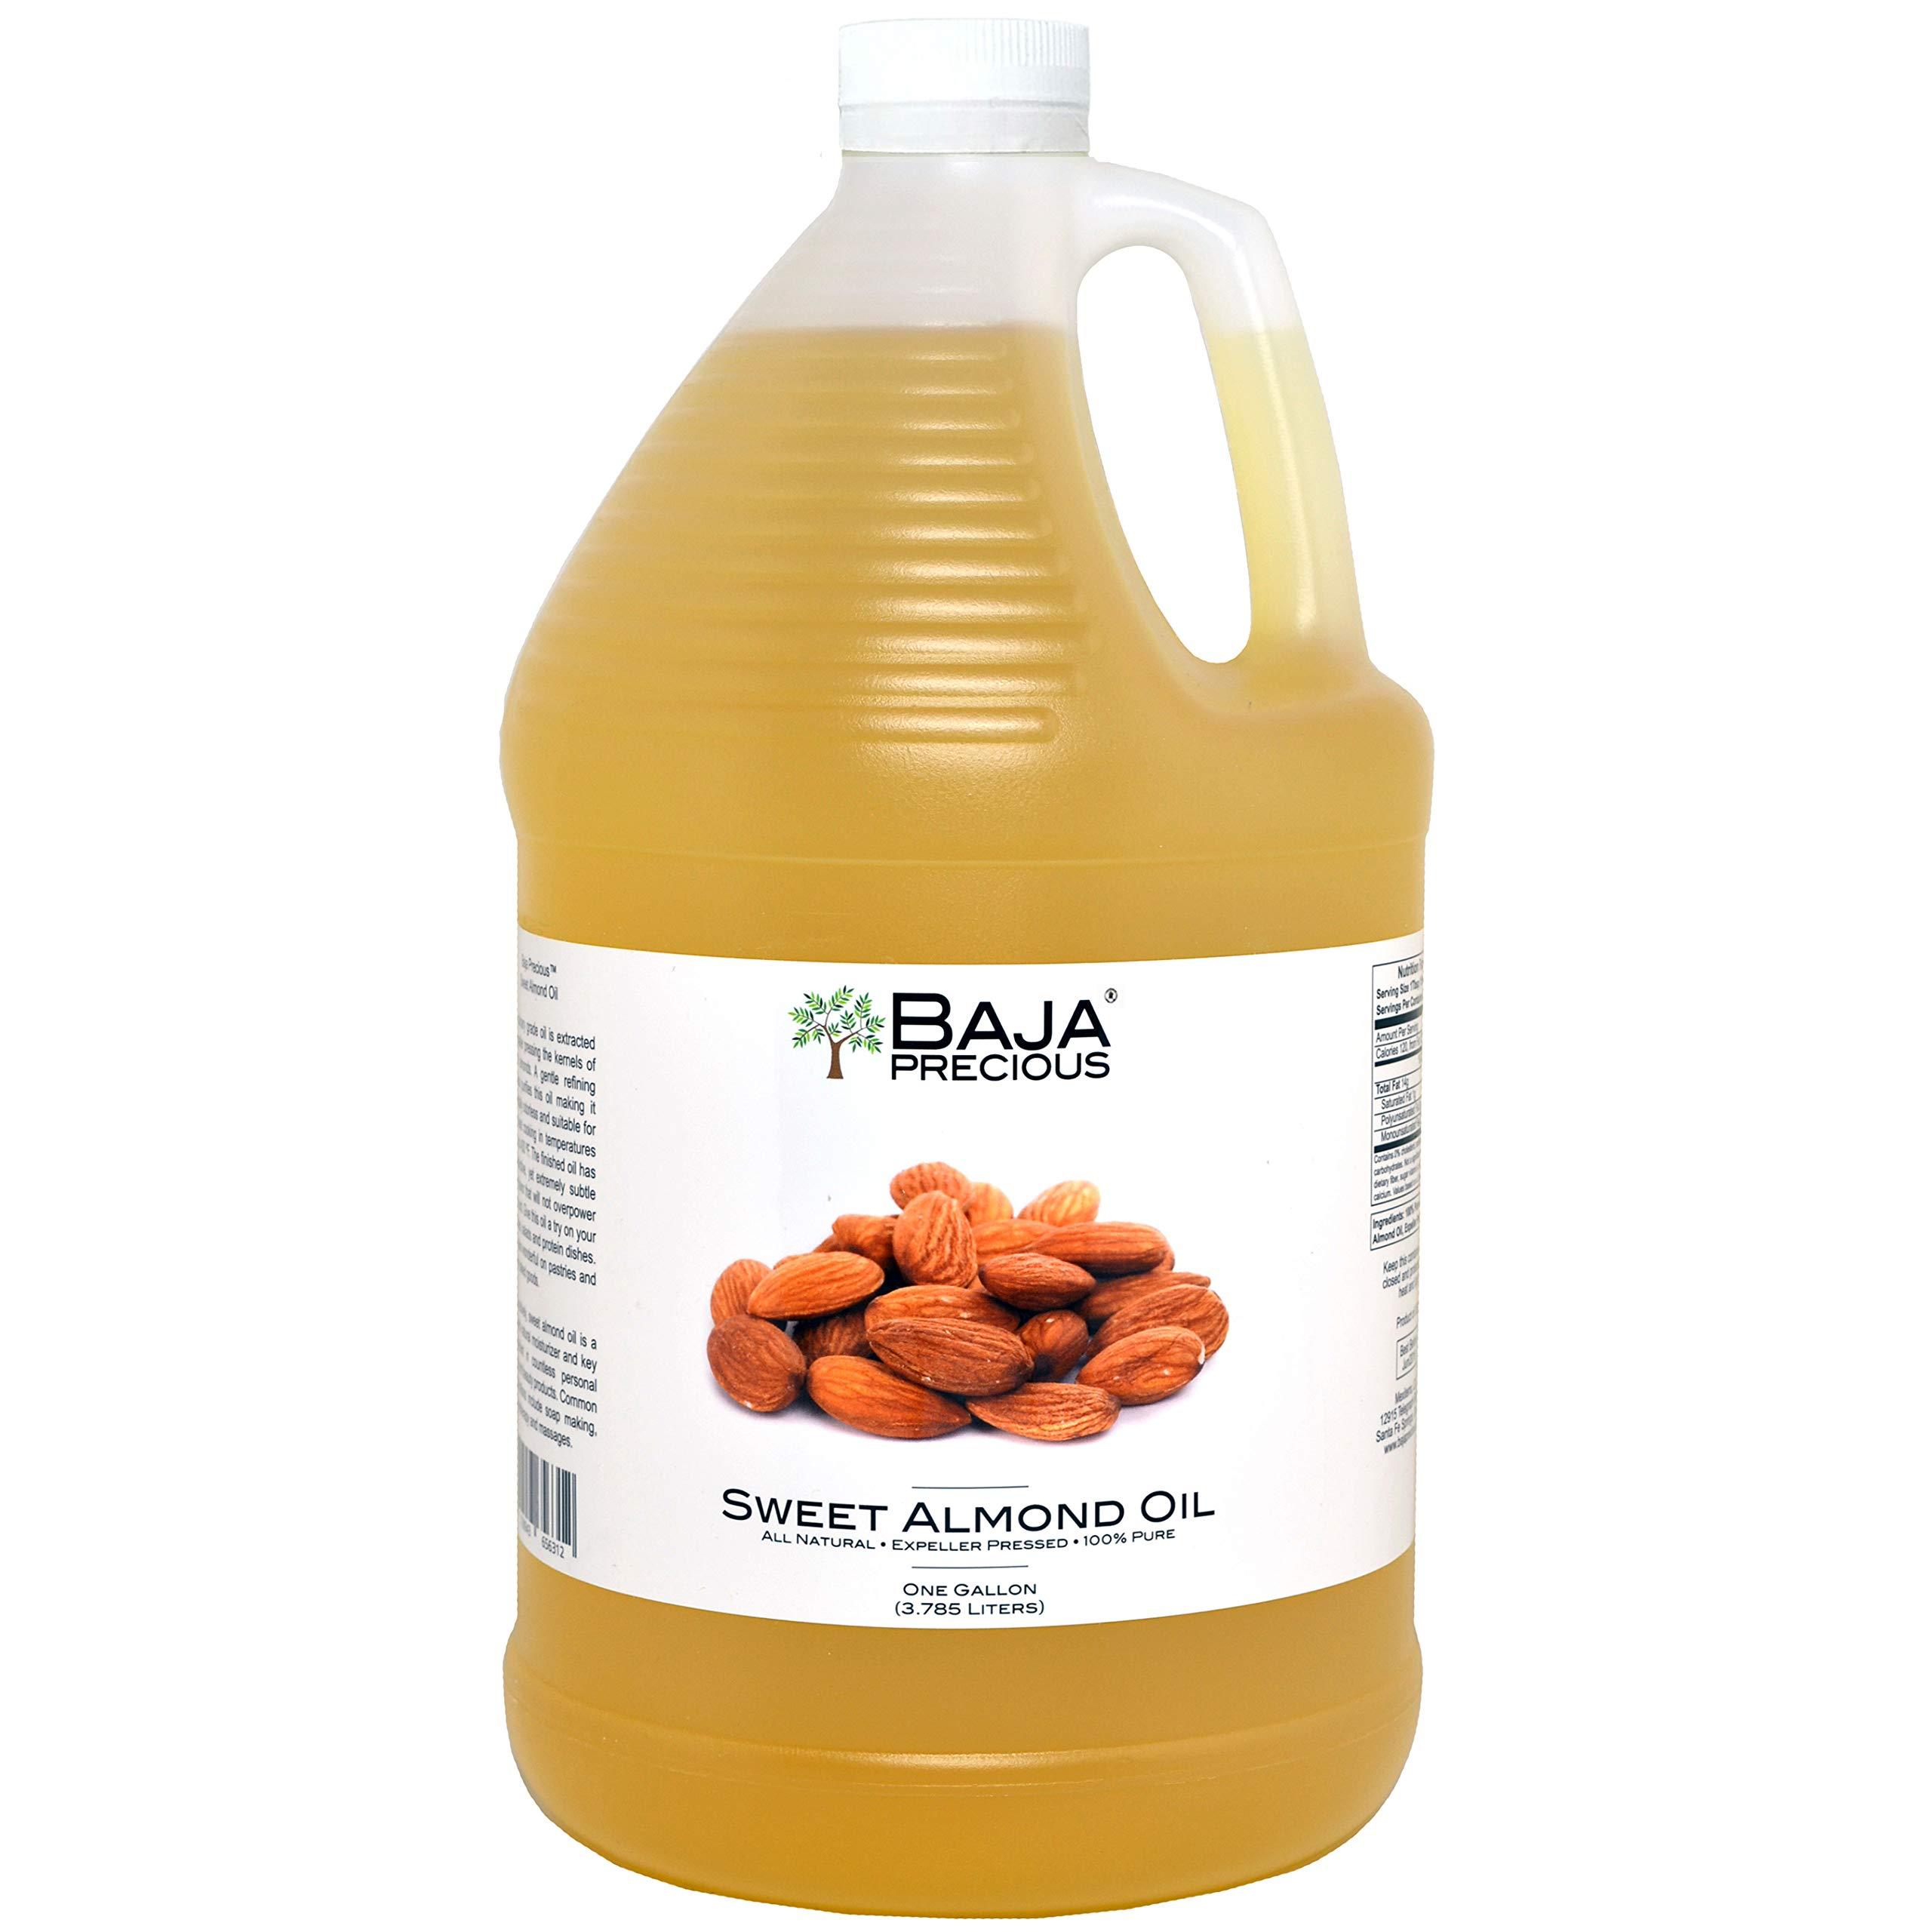 Baja Precious - Sweet Almond Oil, 1 Gallon by Baja Precious